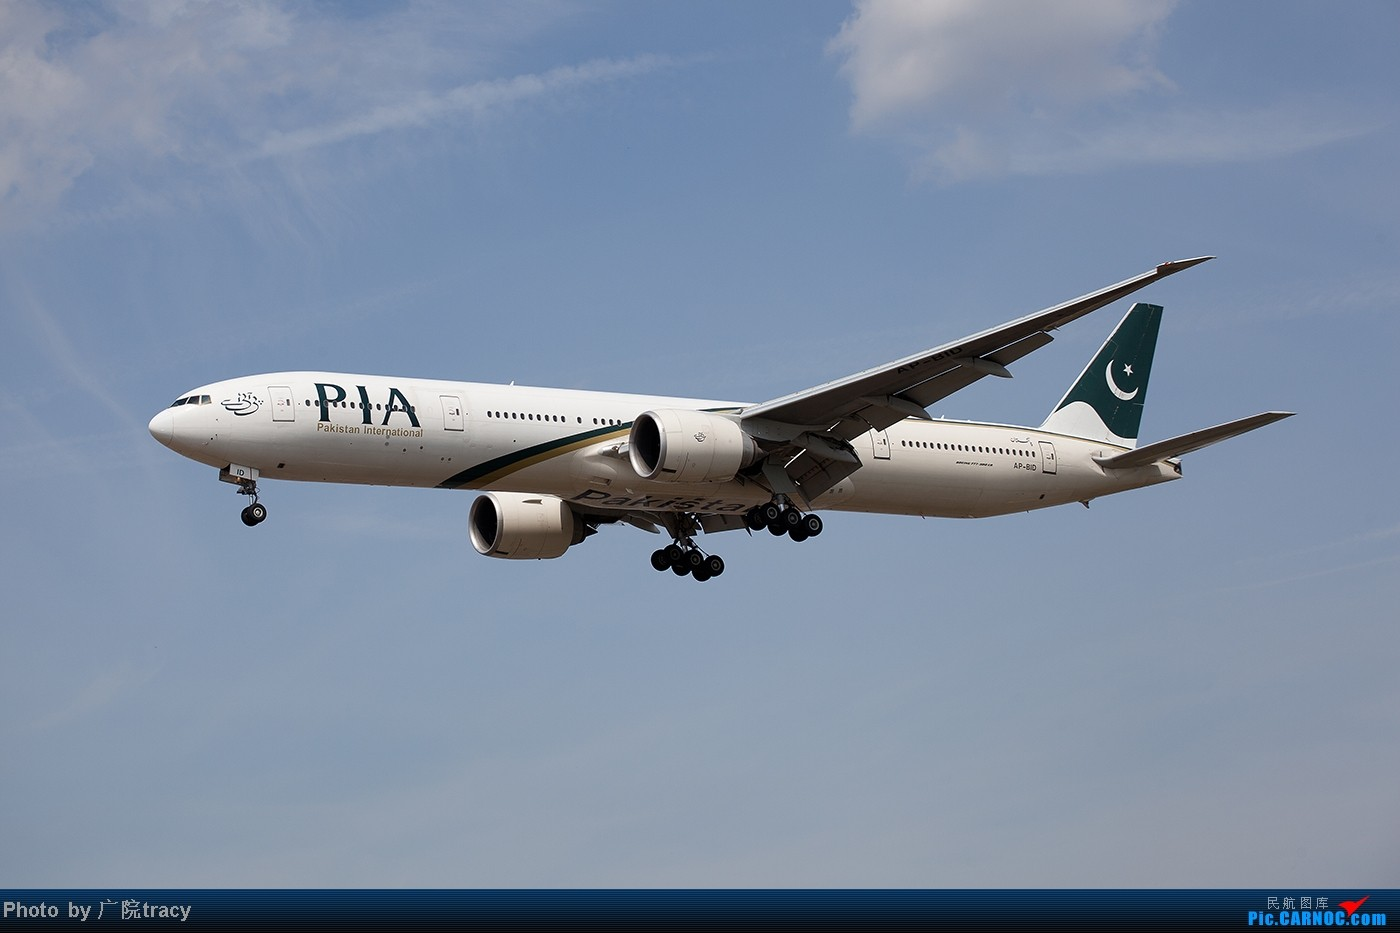 Re:[原创]★ ★ ★ ★ ★中东的航空公司在伦敦希斯罗国际机场  ★ ★ ★ ★ ★ BOEING 777-300ER AP-BID 英国伦敦希思罗机场